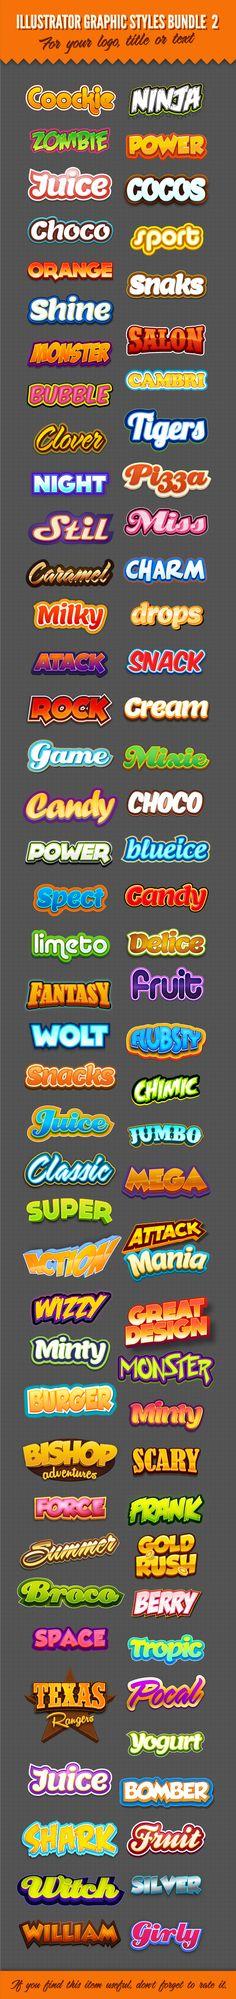 Illustrator Logo Graphic Styles Bundle 2 - Styles Illustrator